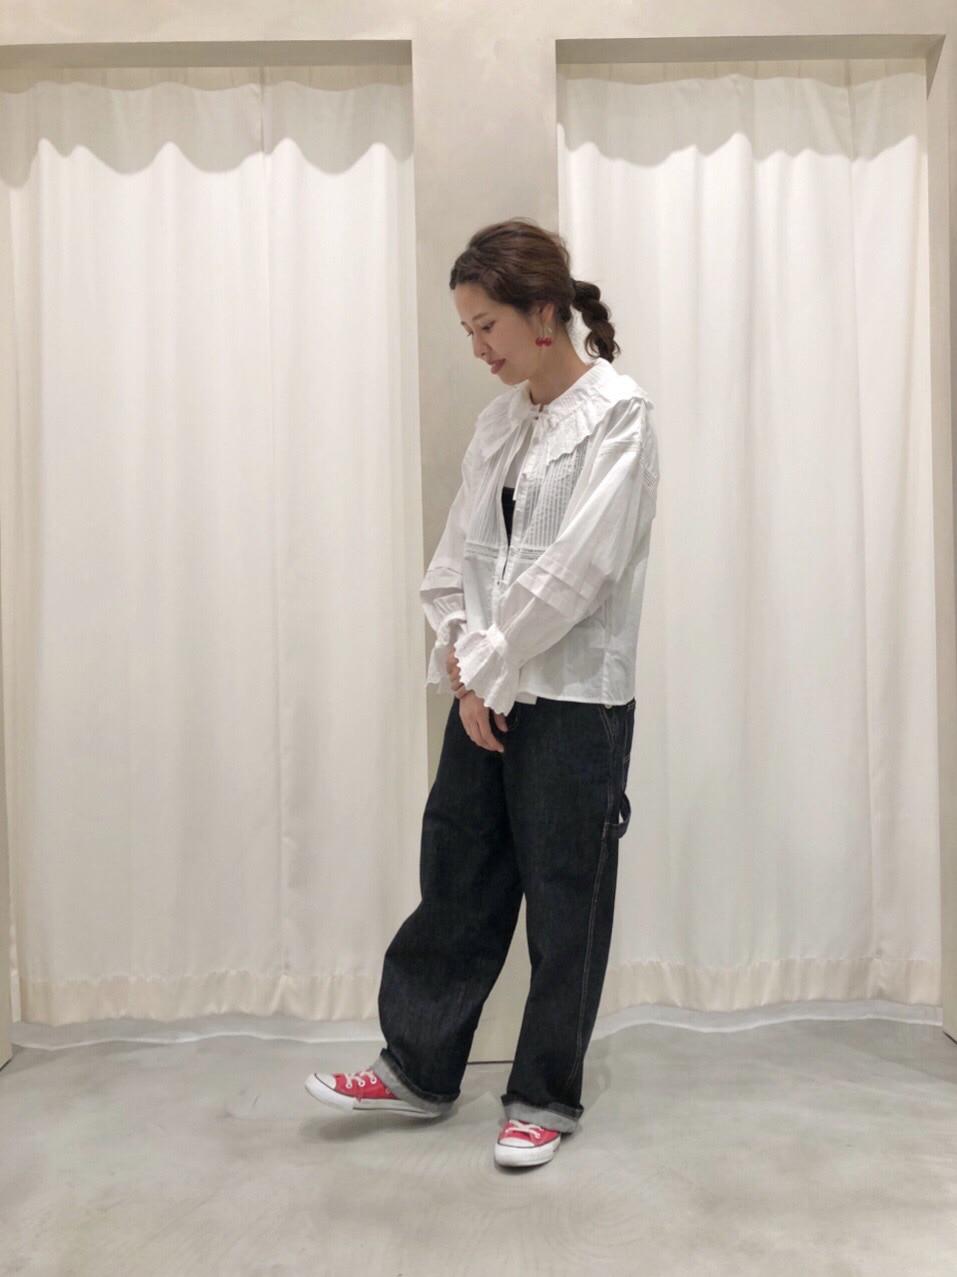 - CHILD WOMAN CHILD WOMAN , PAR ICI 東京スカイツリータウン・ソラマチ 身長:160cm 2020.09.09